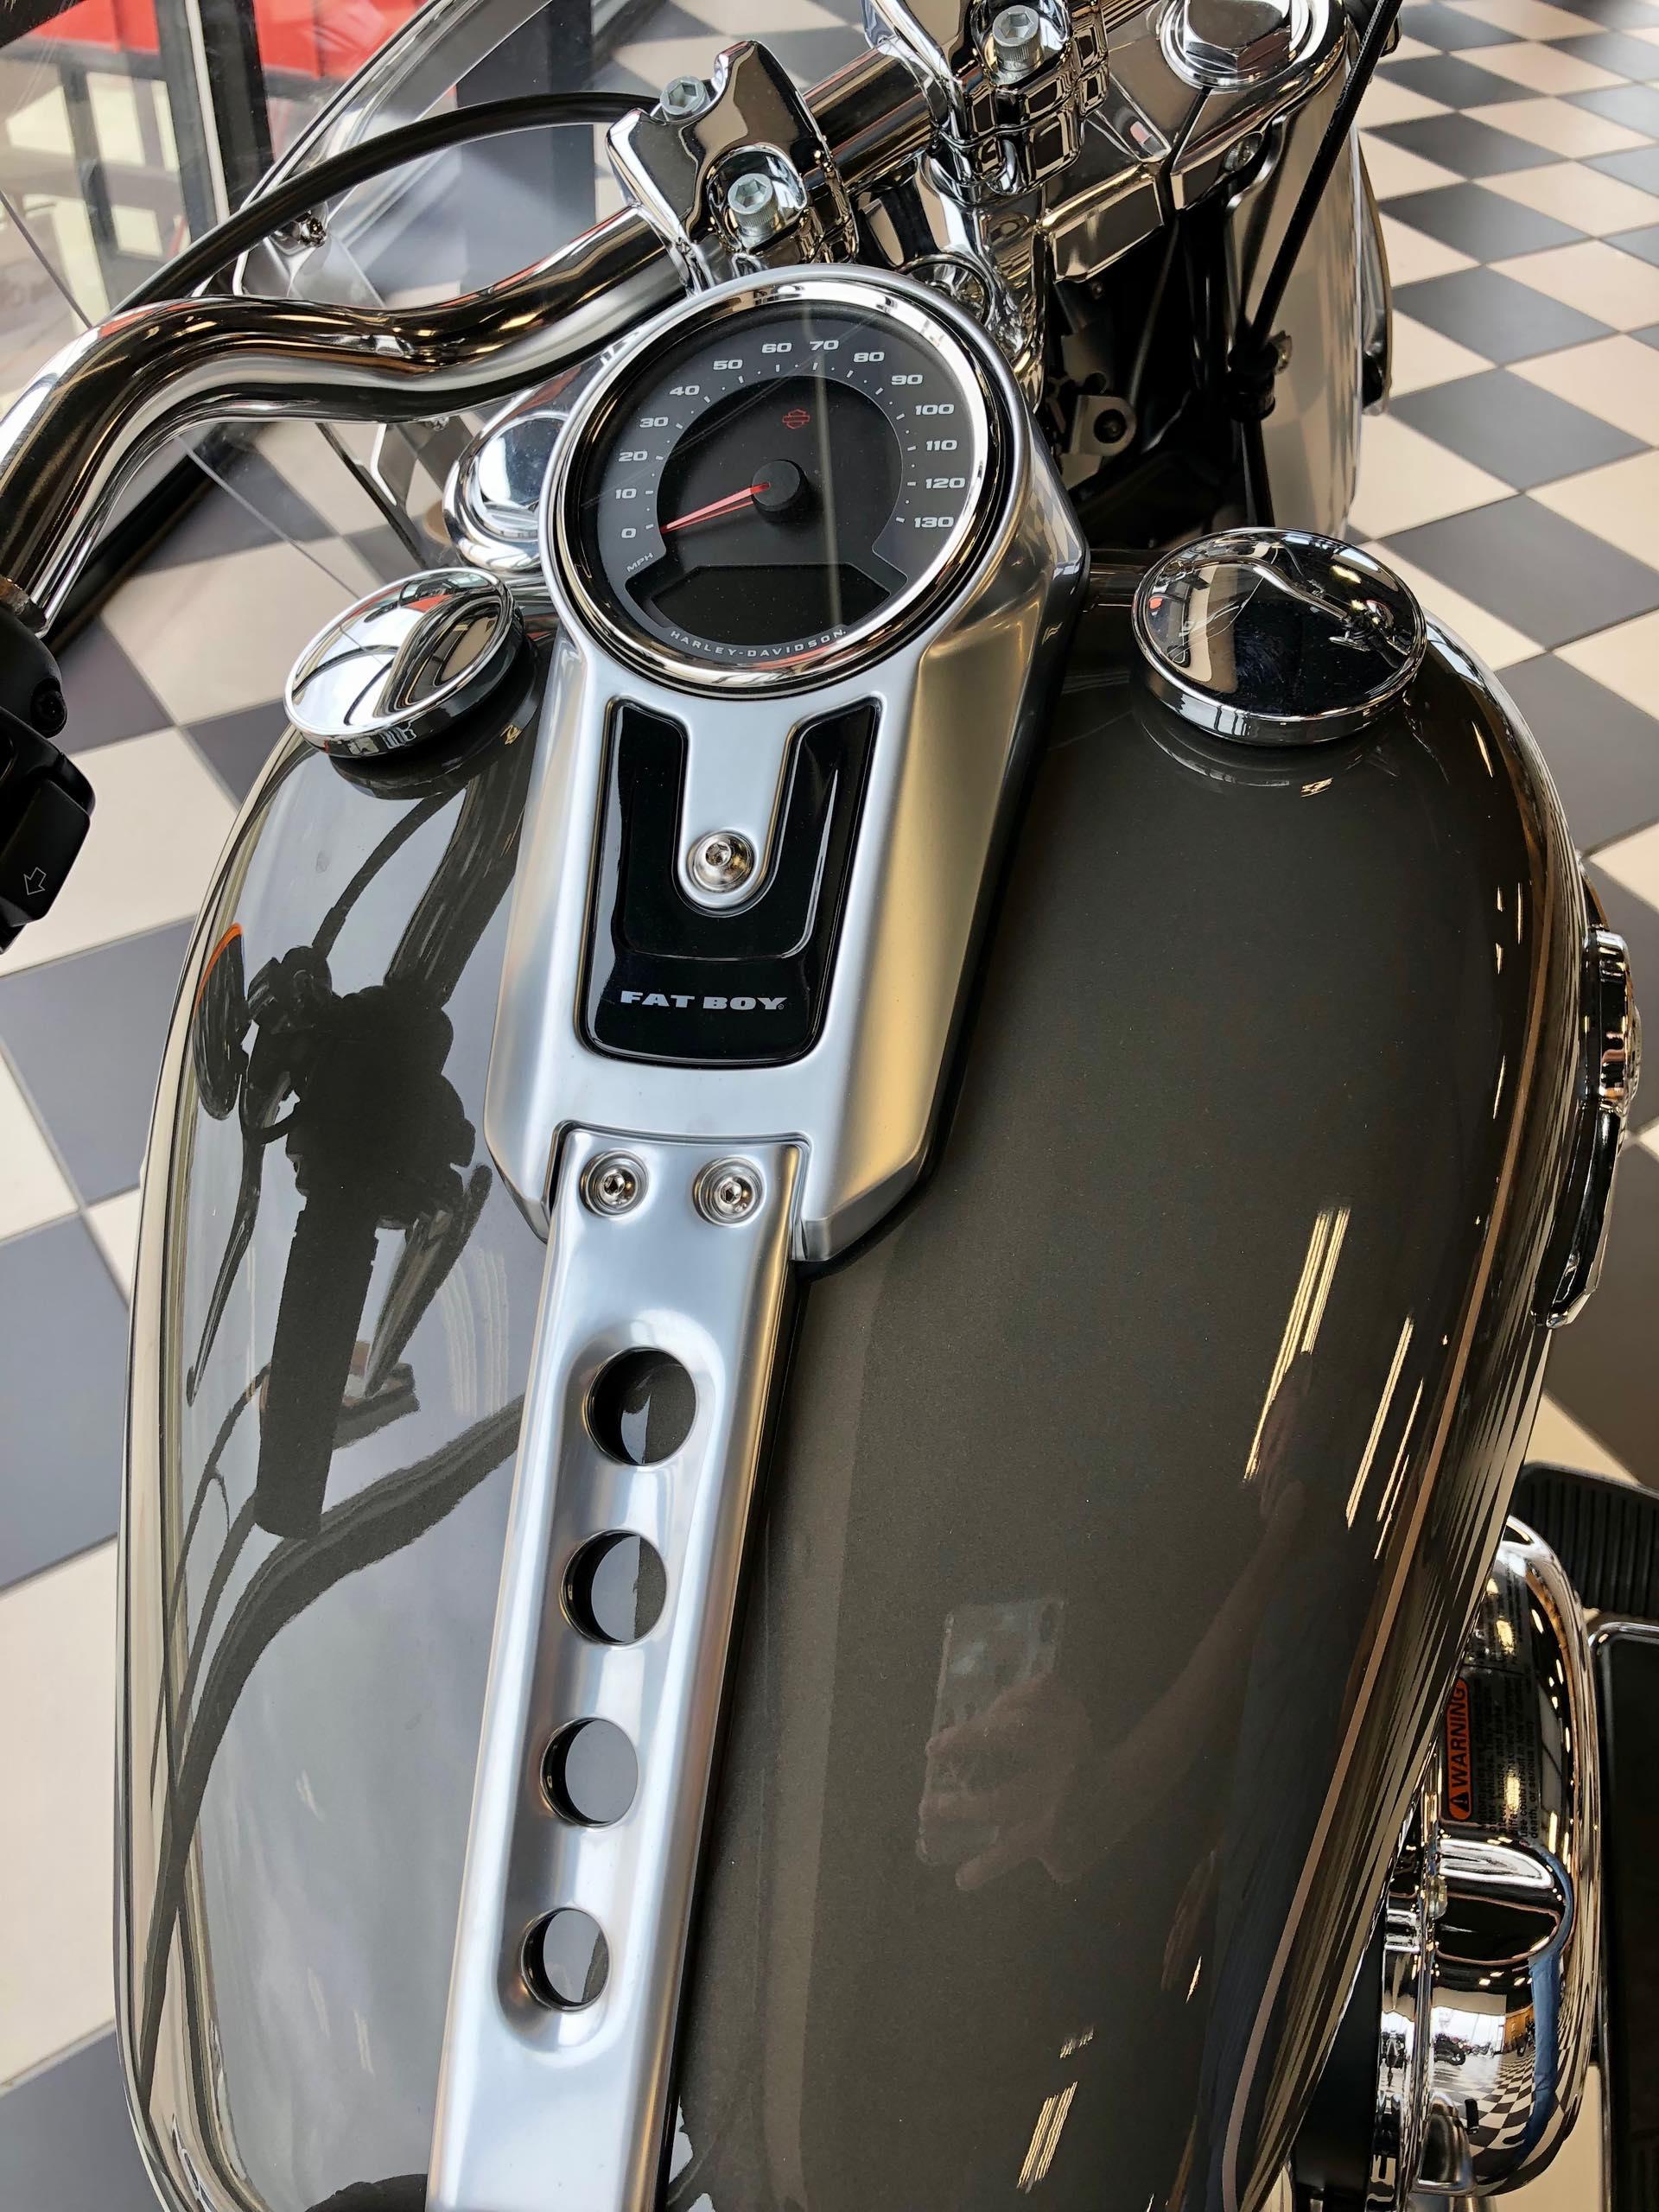 2018 Harley-Davidson Softail Fat Boy at Deluxe Harley Davidson